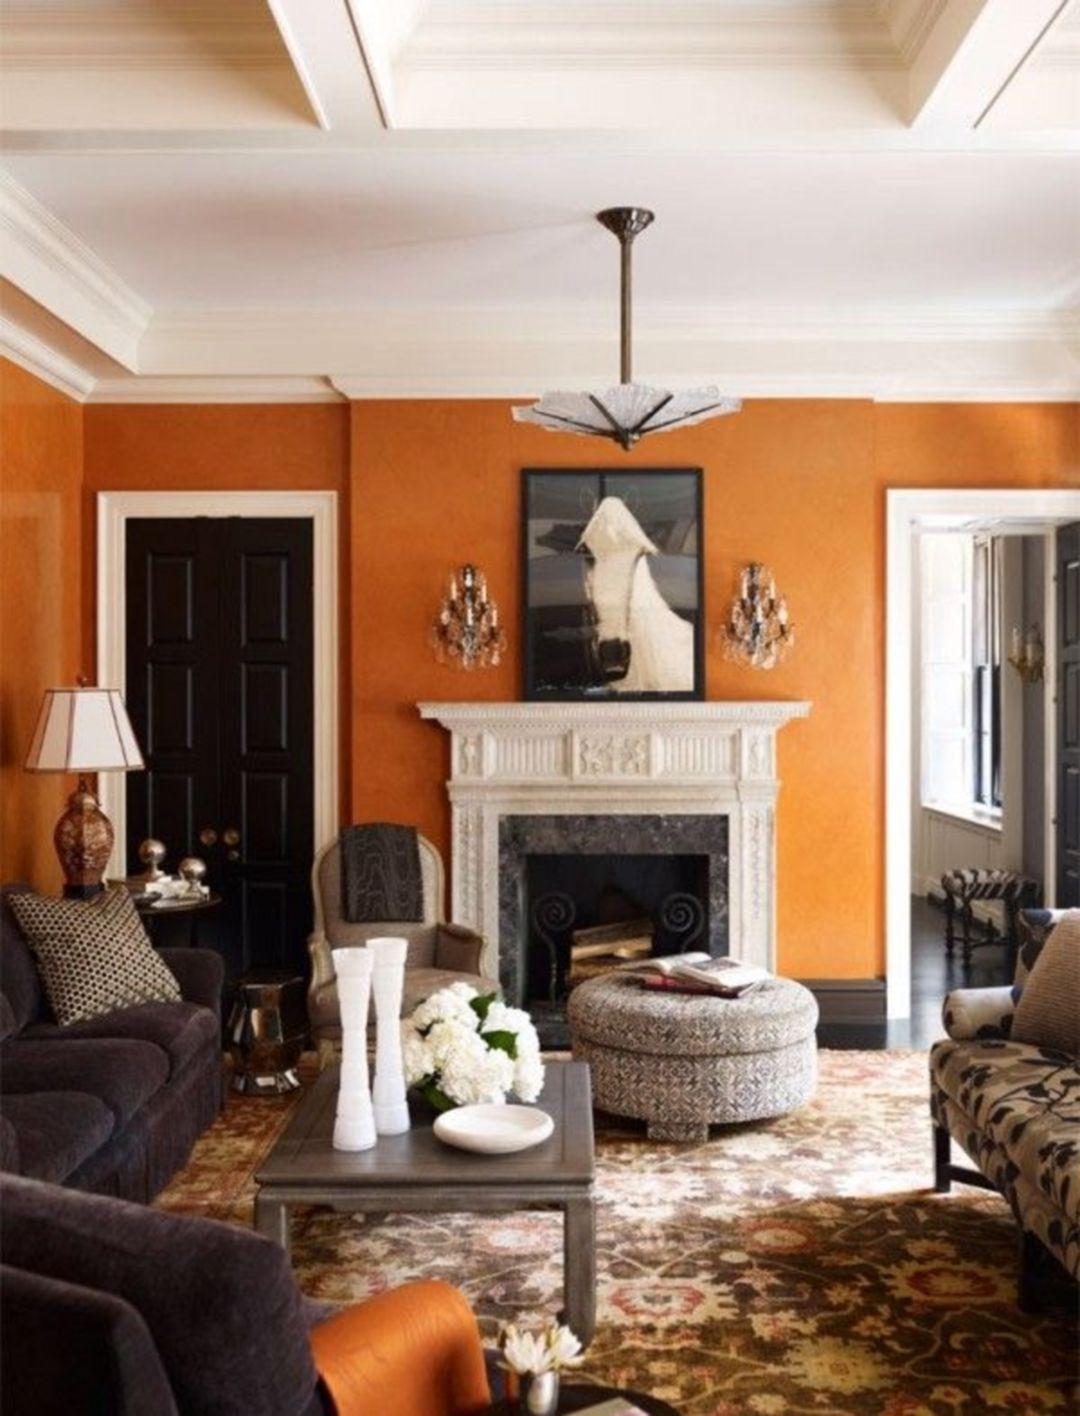 30 charming living room design with orange color themes living rh pinterest com